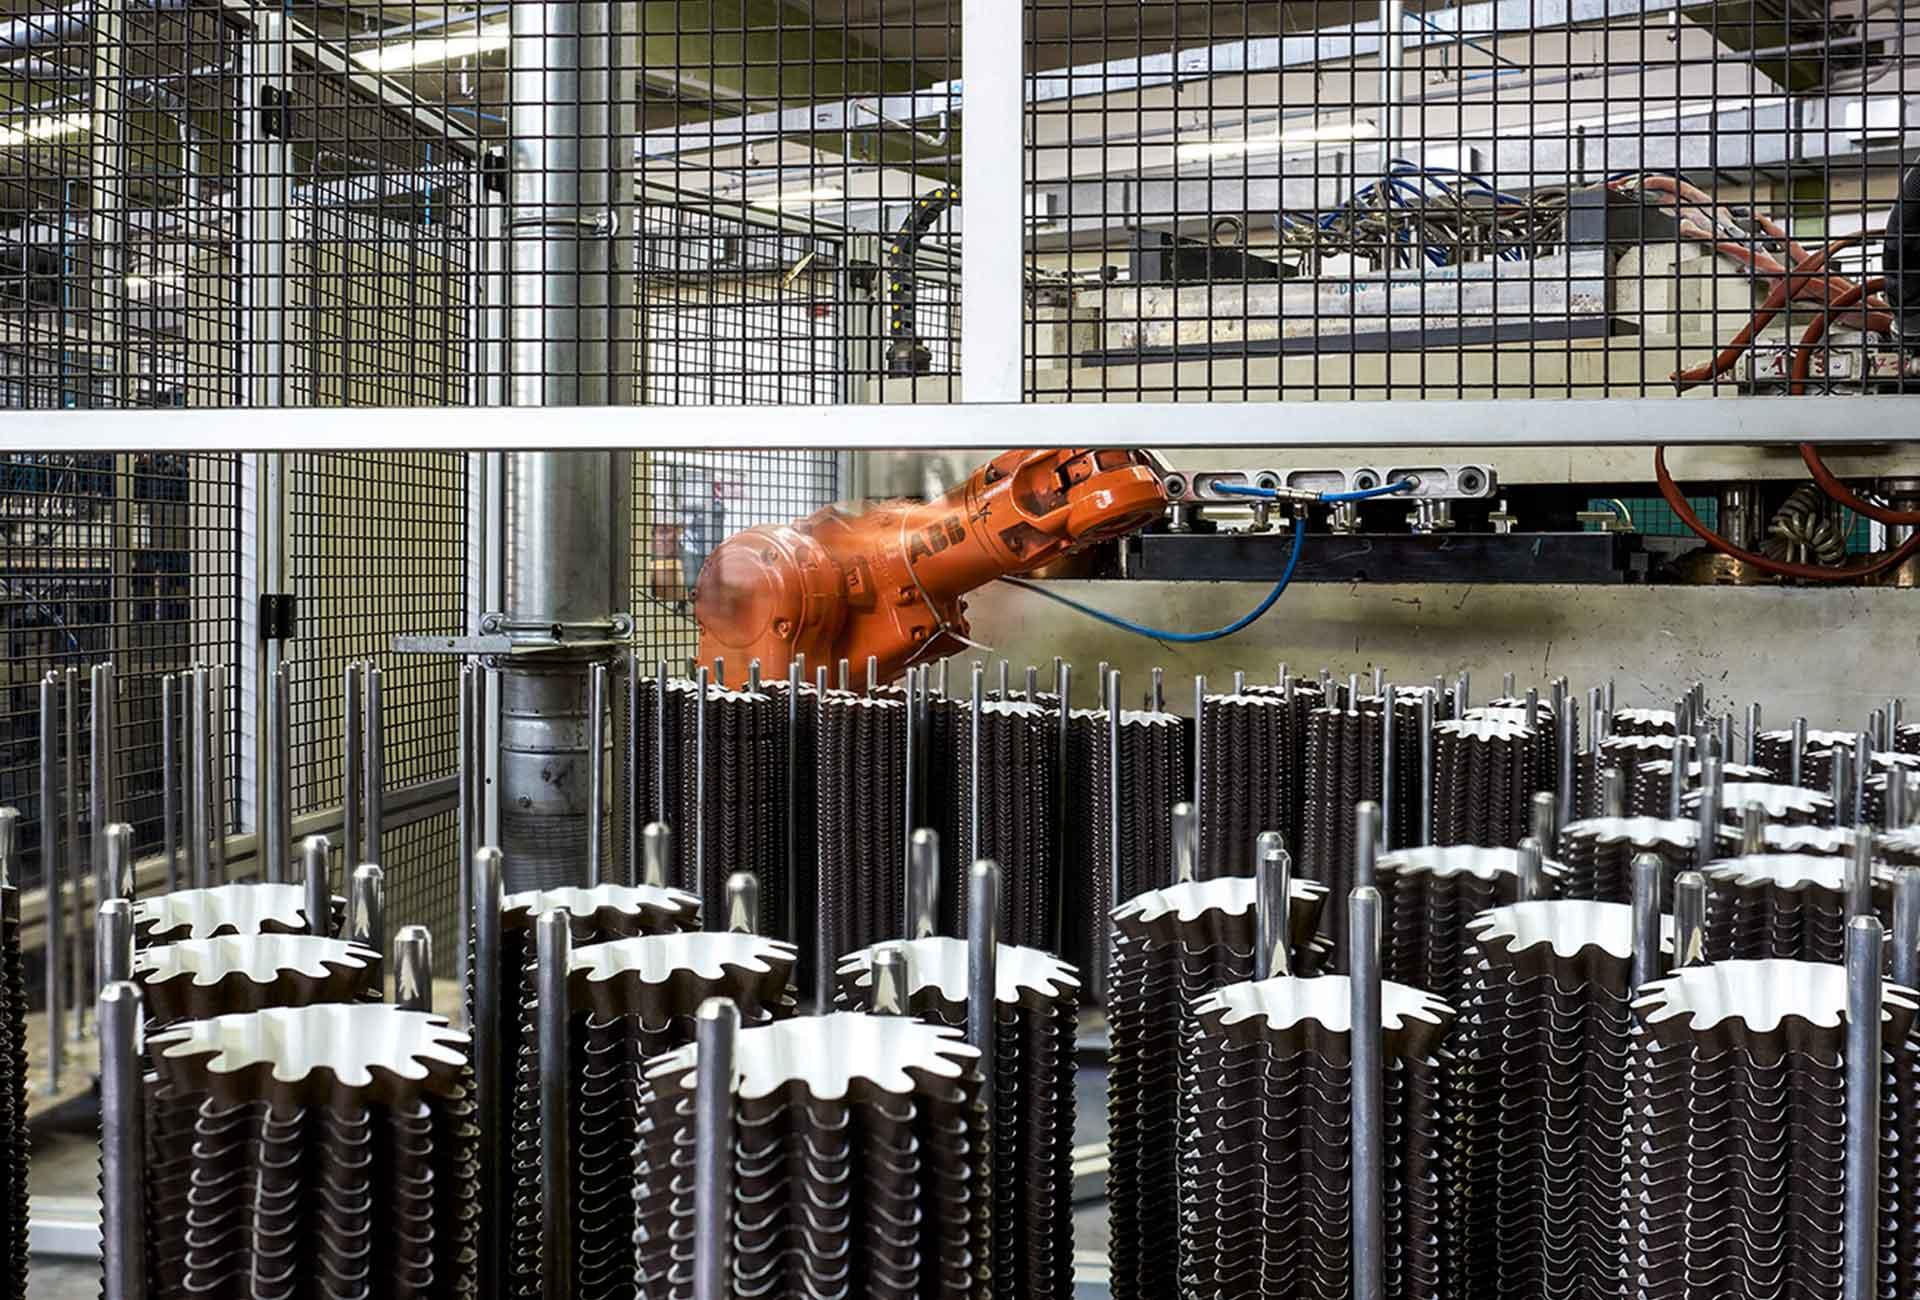 Novacart Russia machineries